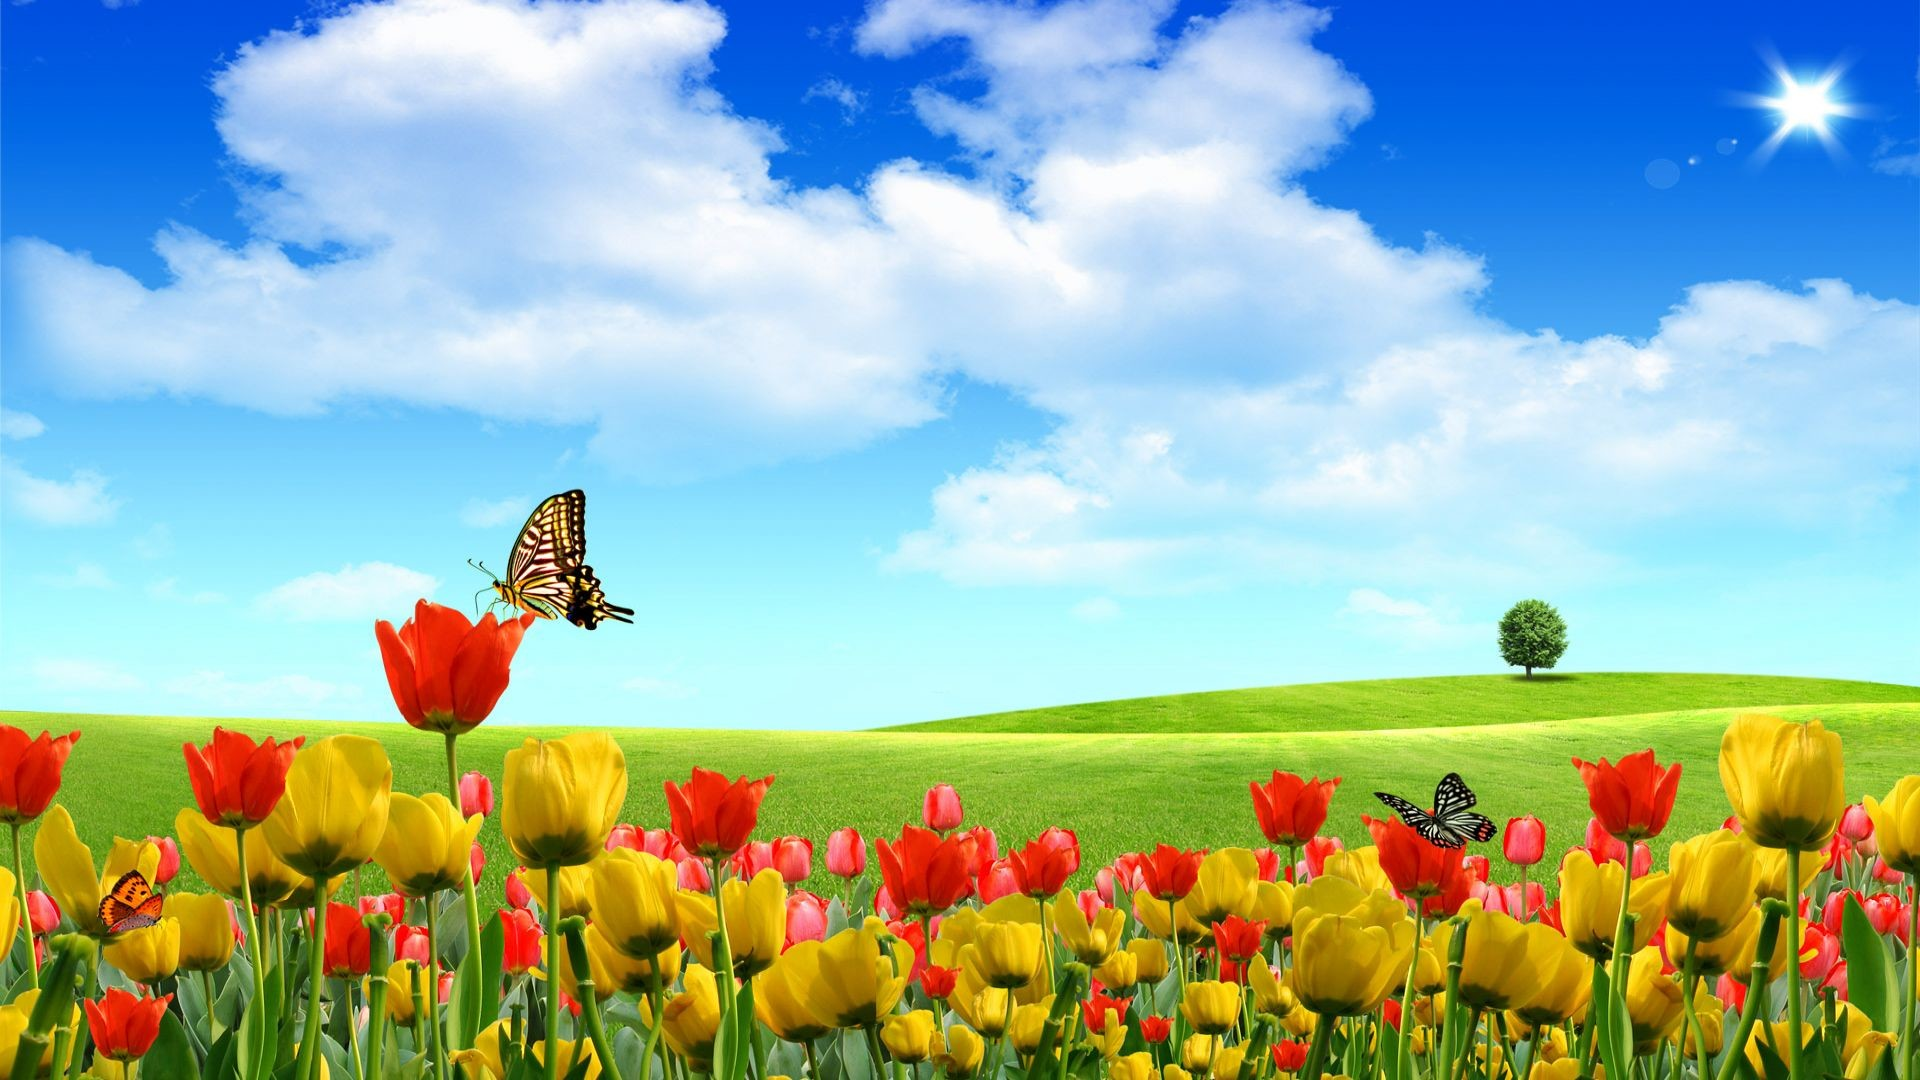 Seasonal Free Desktop Wallpaper   Desktop Image